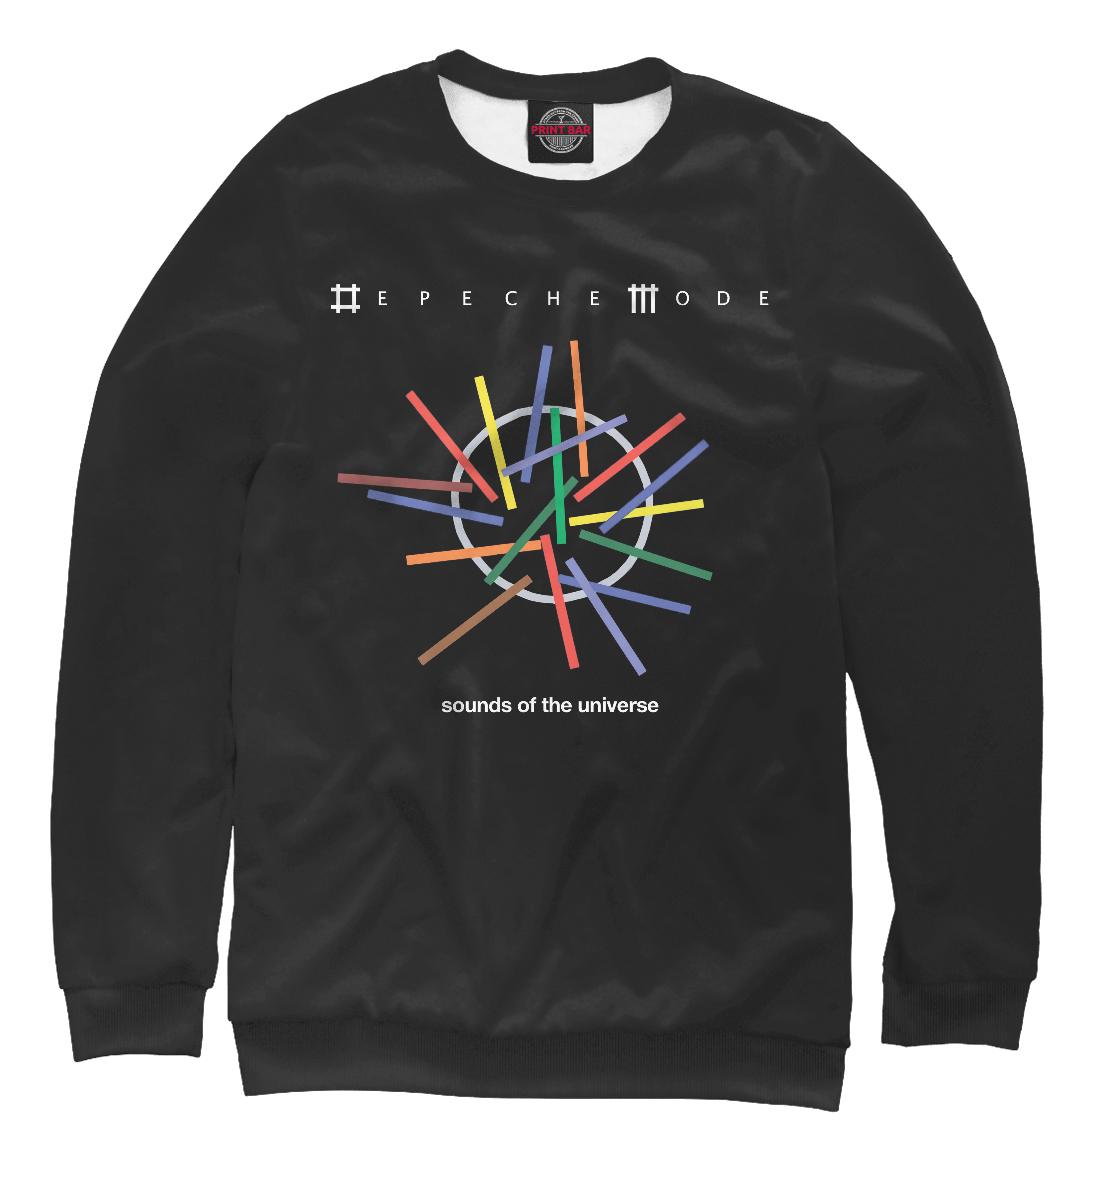 Купить Depeche Mode, Printbar, Свитшоты, DPM-489061-swi-1